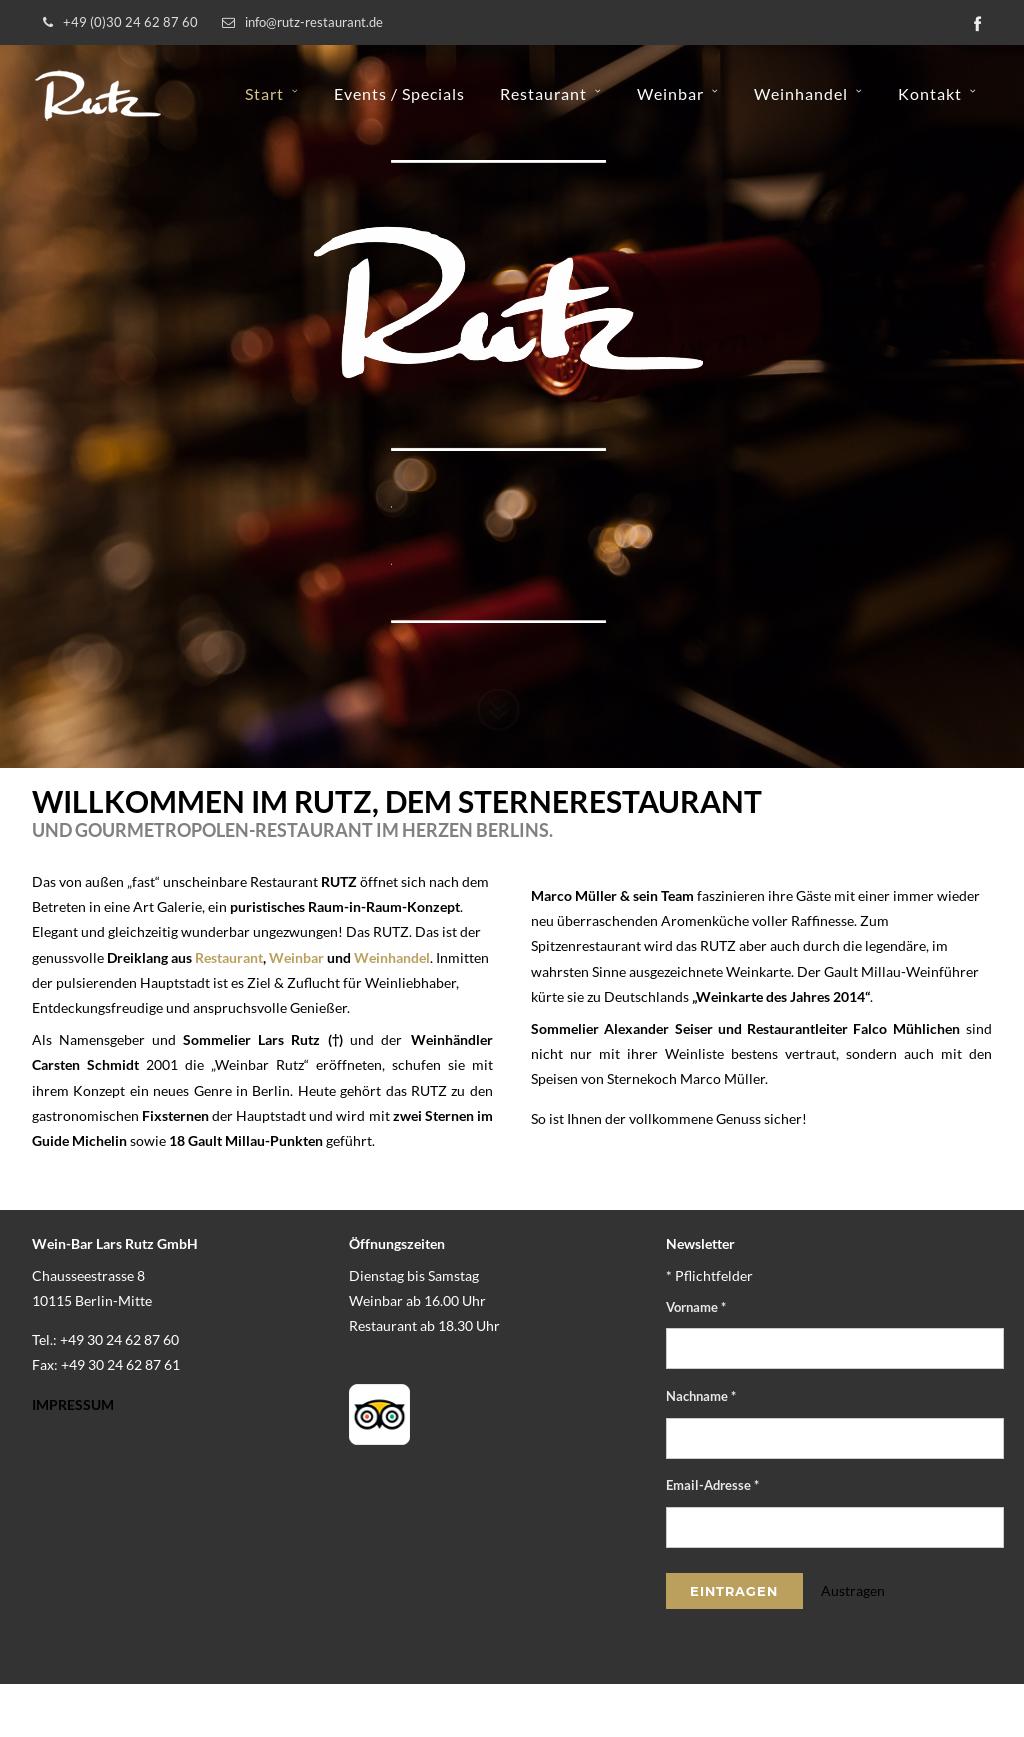 Weinbar Rutz Competitors, Revenue and Employees - Owler Company Profile